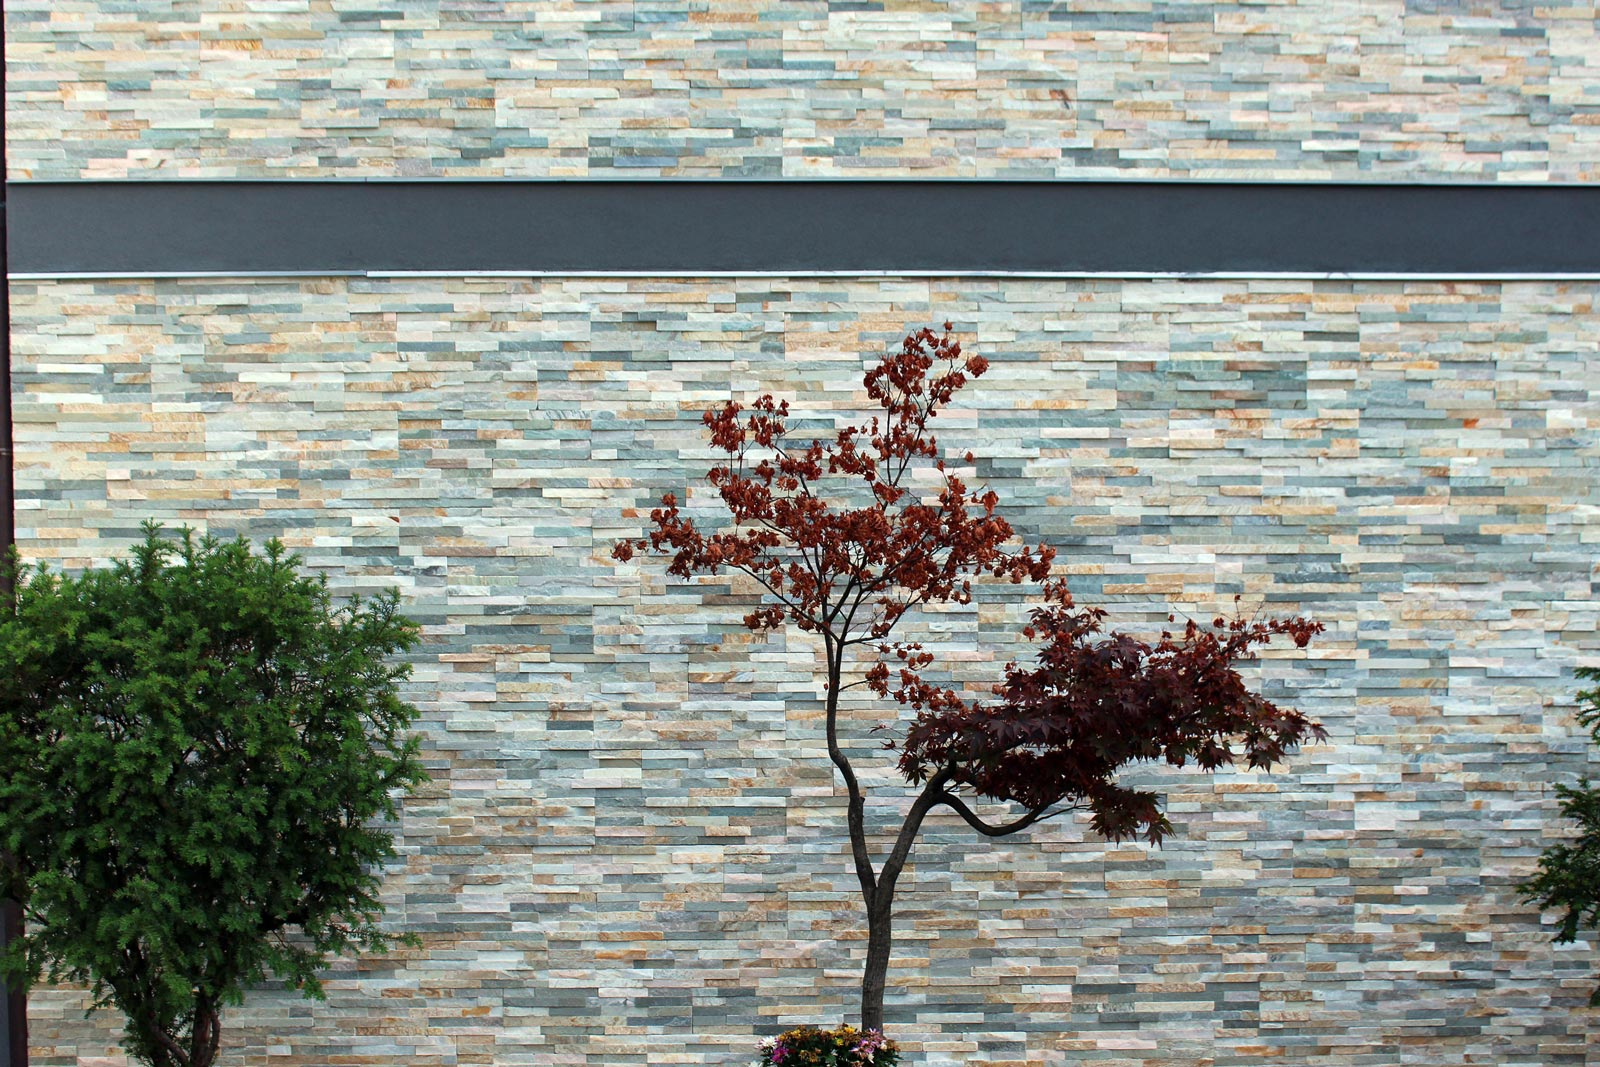 [49] Una facciata frammentata - homes, small thickness preassembled coverings